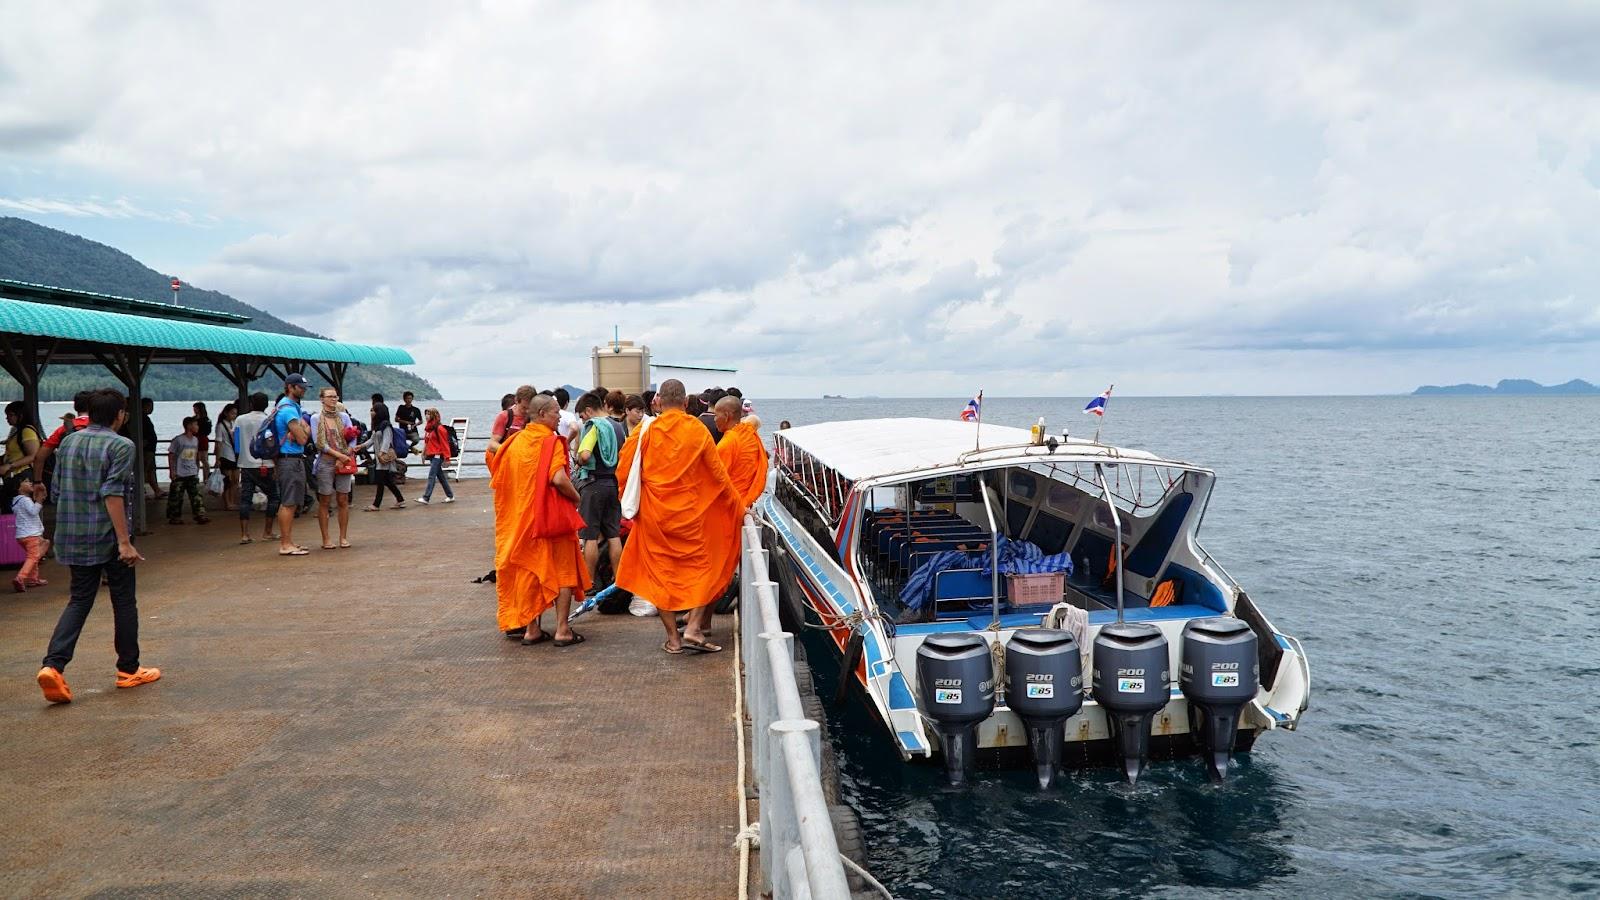 Arriving in Koh Lipe's 'floating jetty'. Hold on, we aren't in Koh Lipe yet